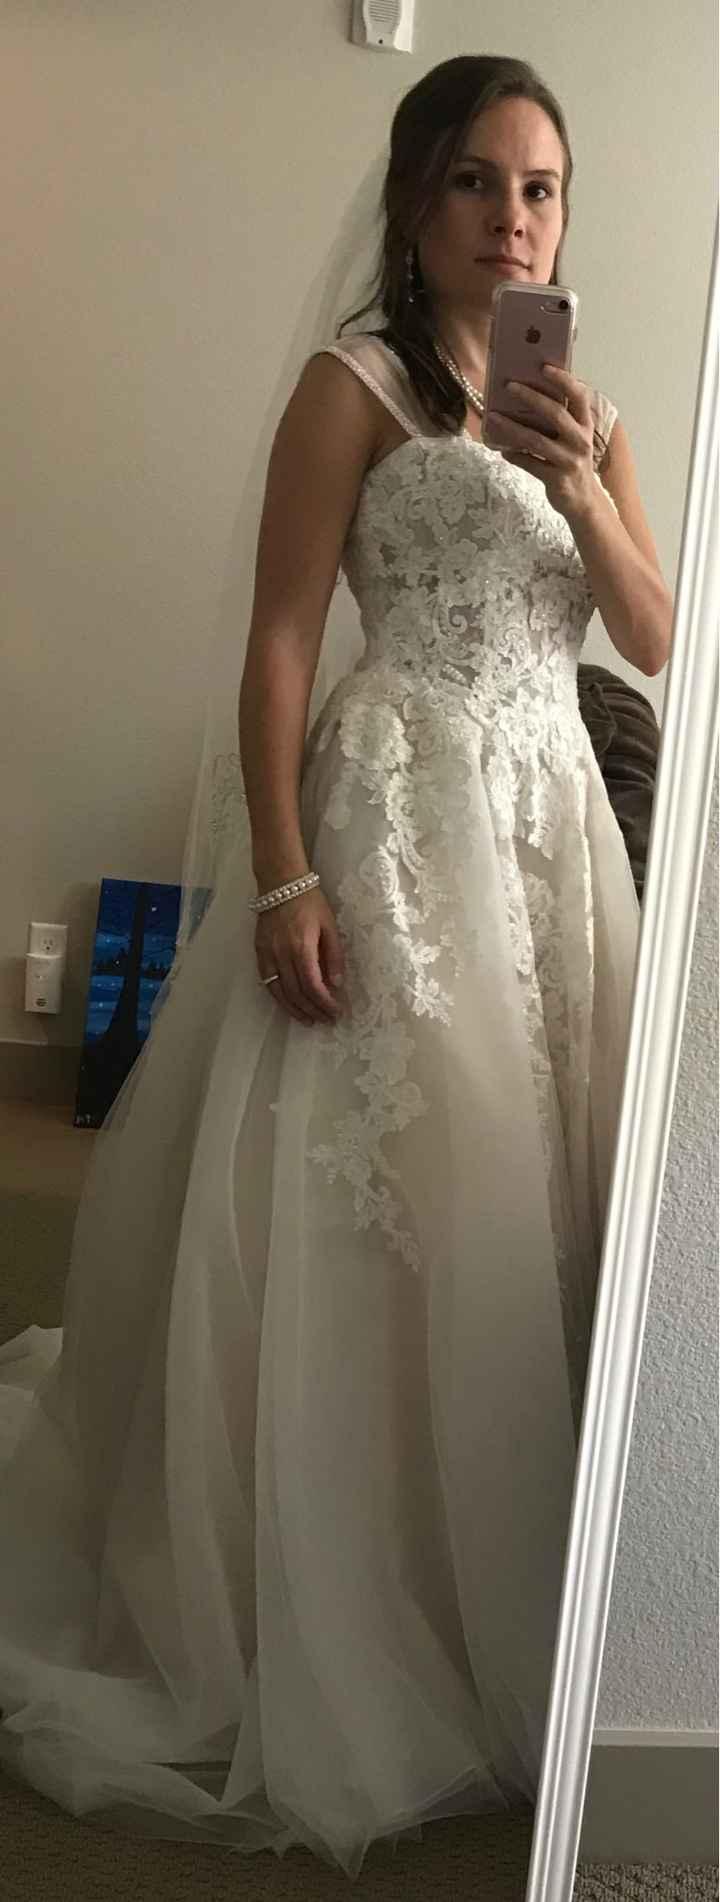 Adding thicker straps to wedding dress - 2